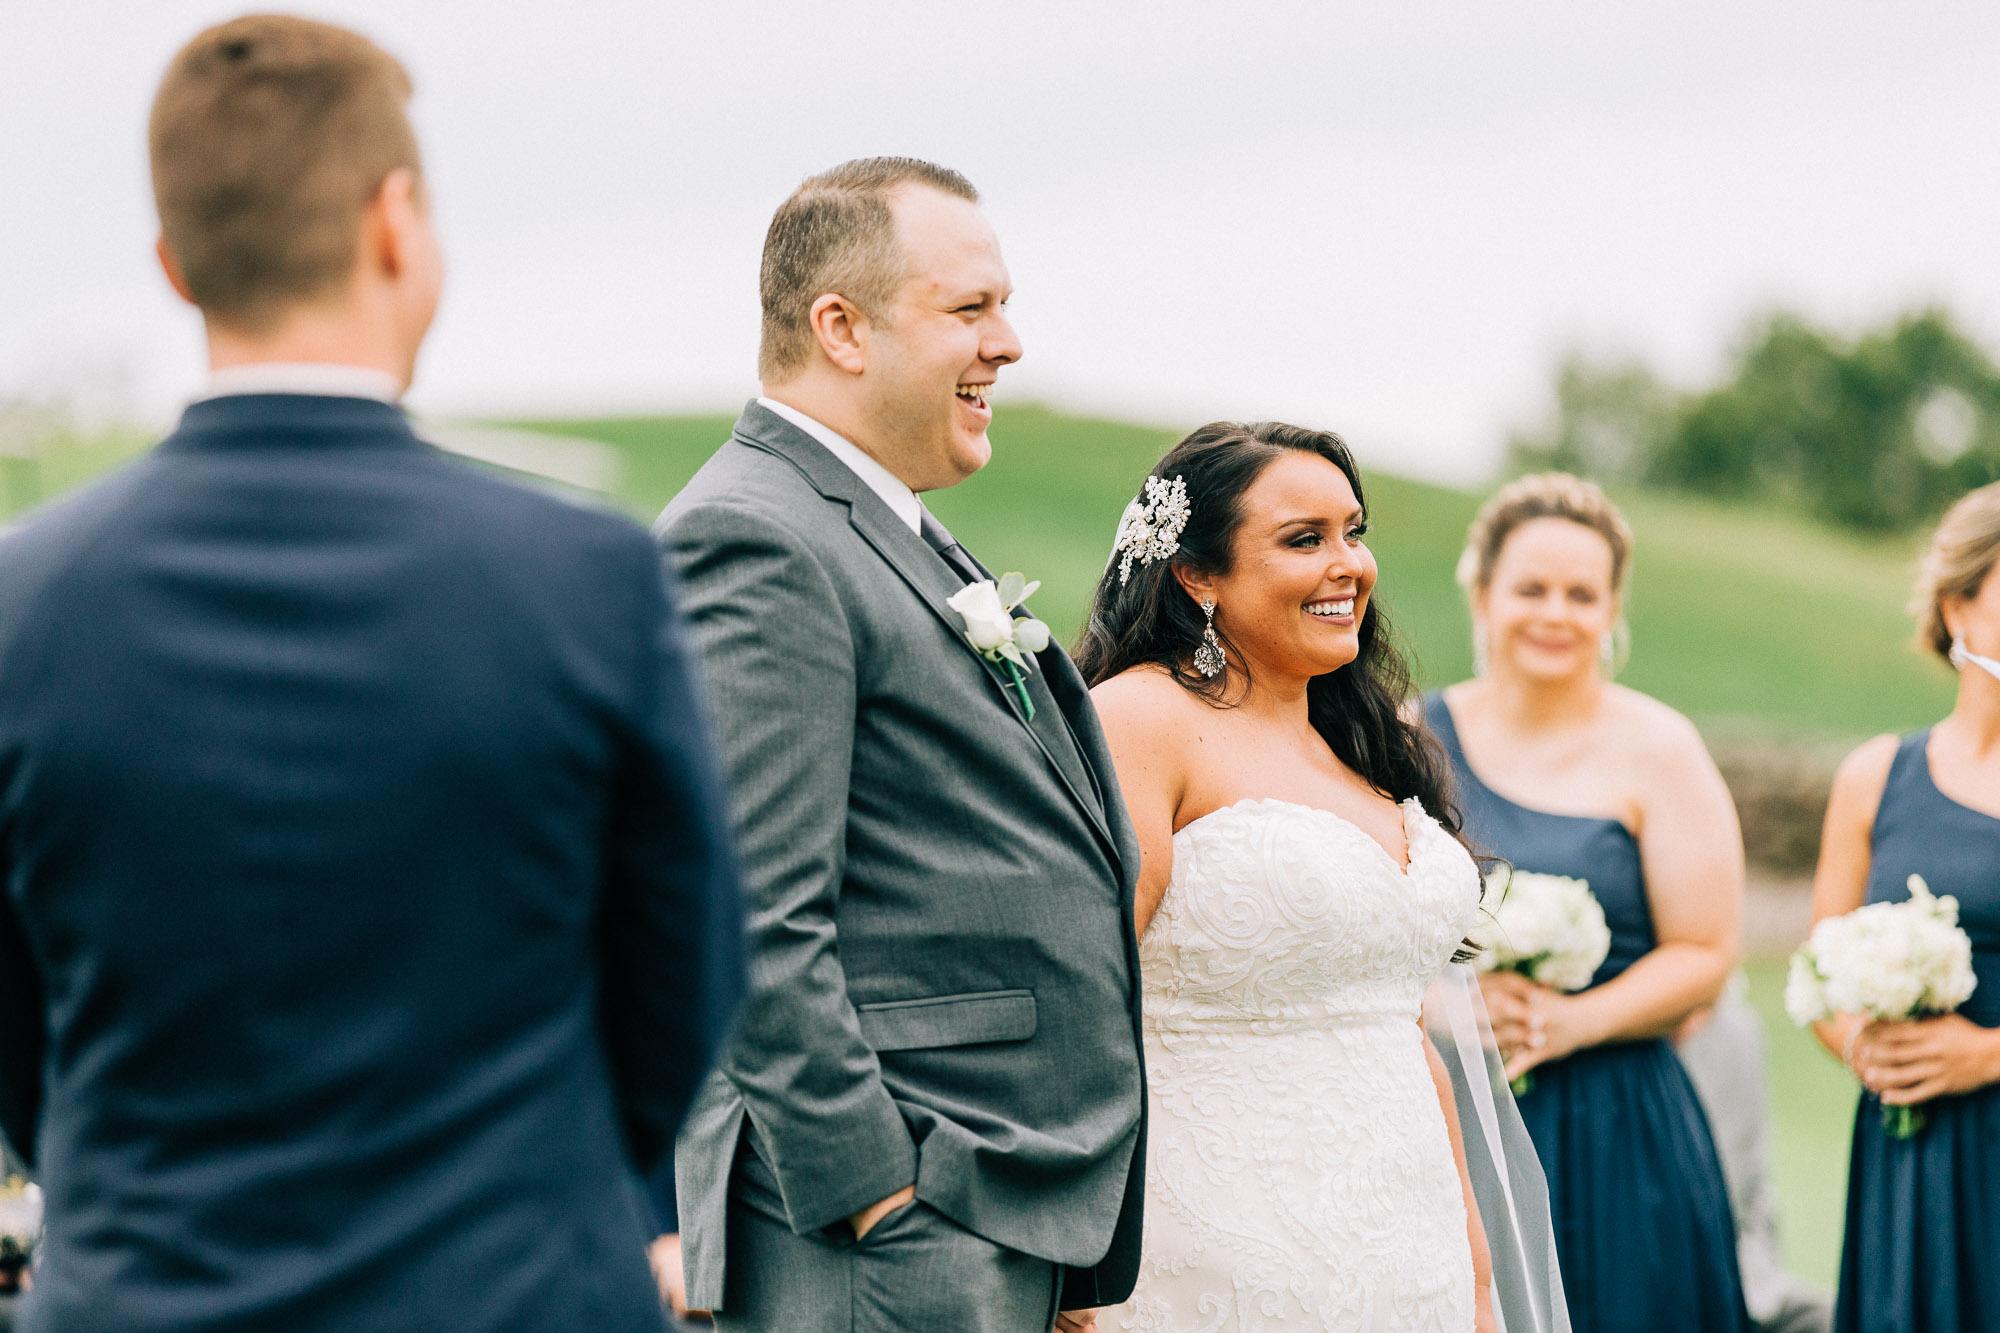 stonhedge-country-club-wedding-8291.jpg